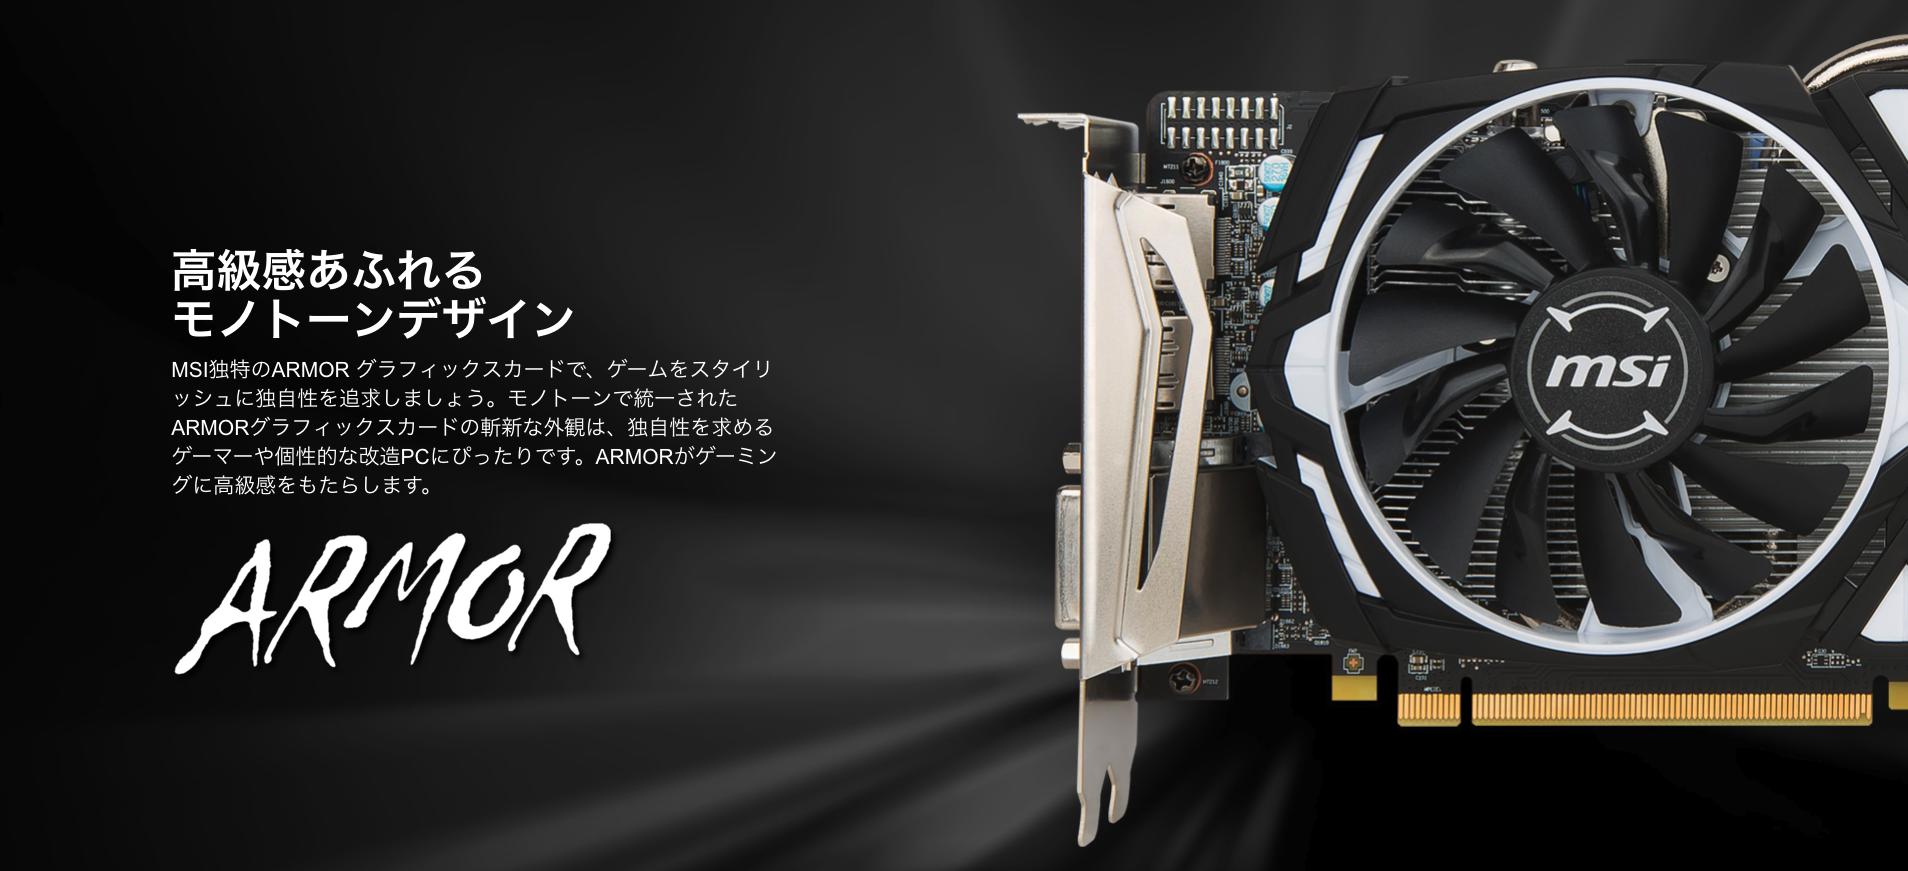 MSI Radeon RX 470 Armor 8G(バルク)